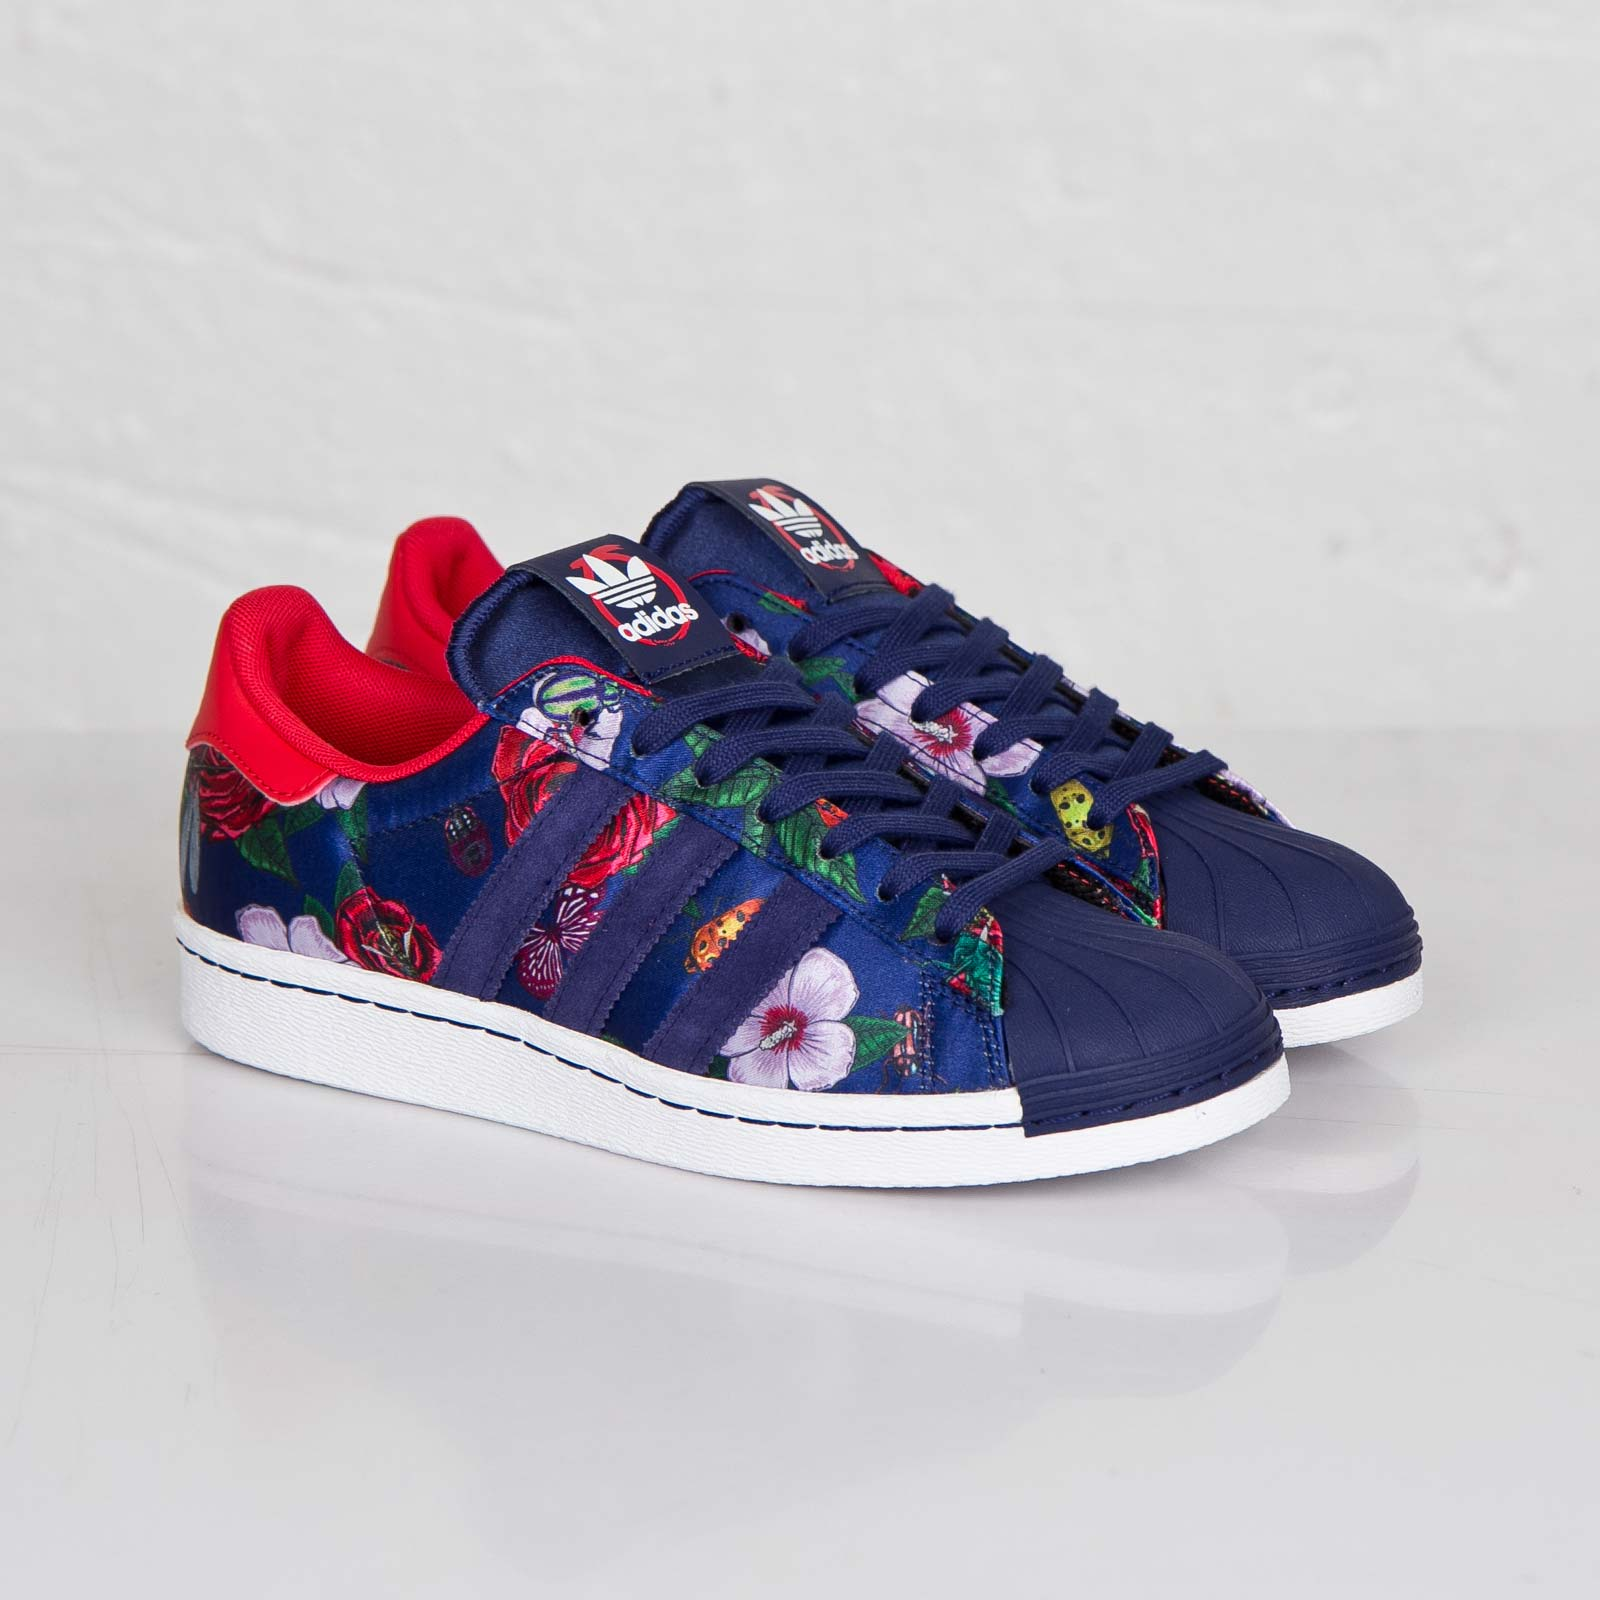 promo code 8983f f7ca9 adidas Superstar 80s W - M19071 - Sneakersnstuff | sneakers ...